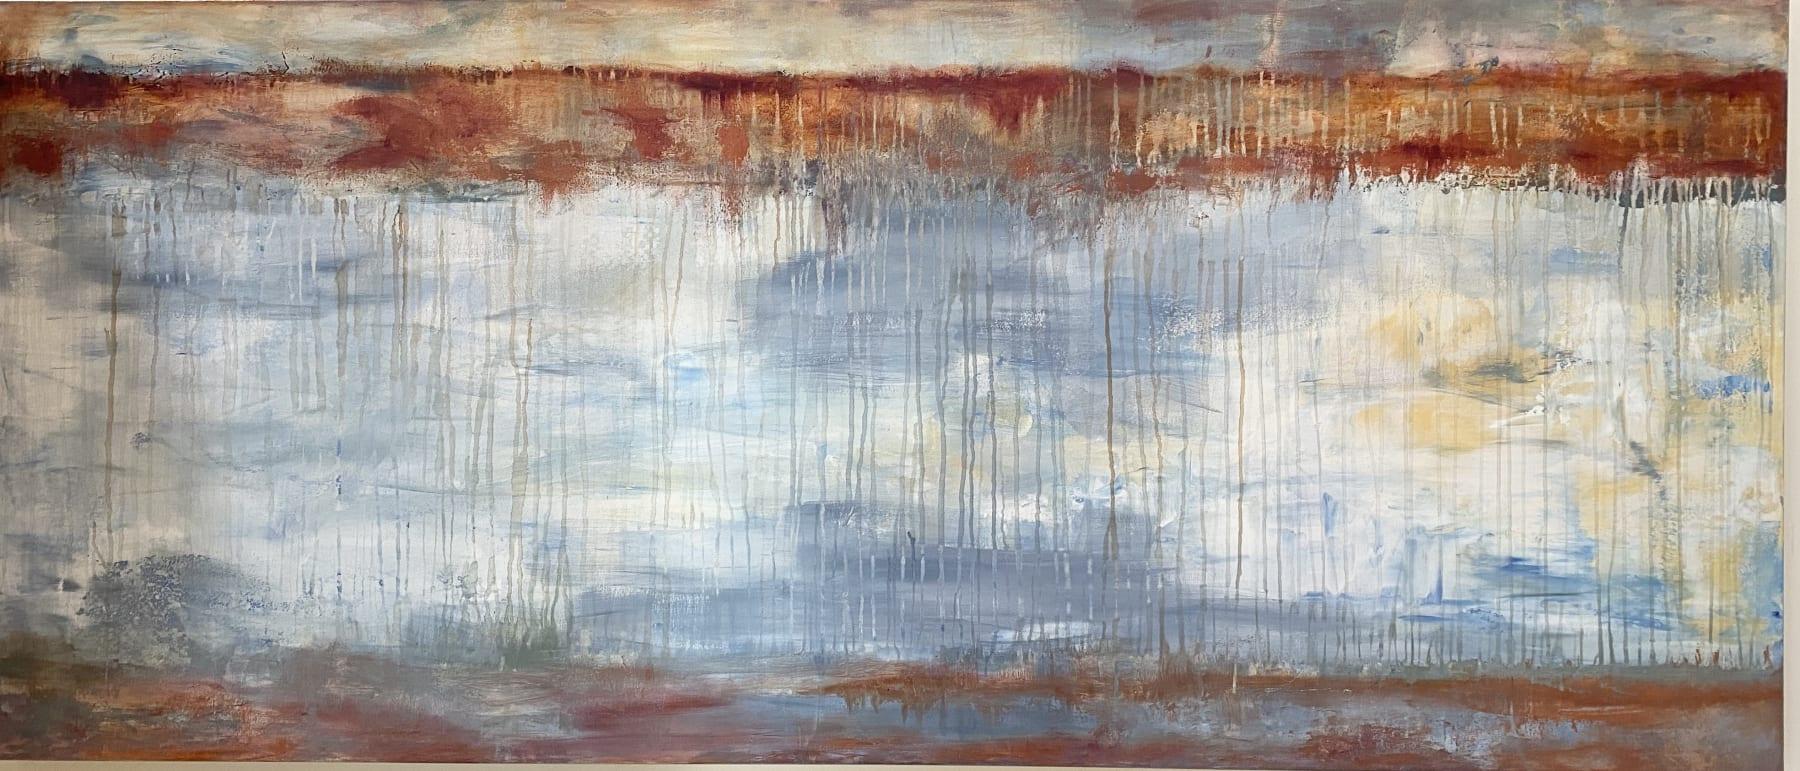 Patricia Qualls, Across the Generations, 2014